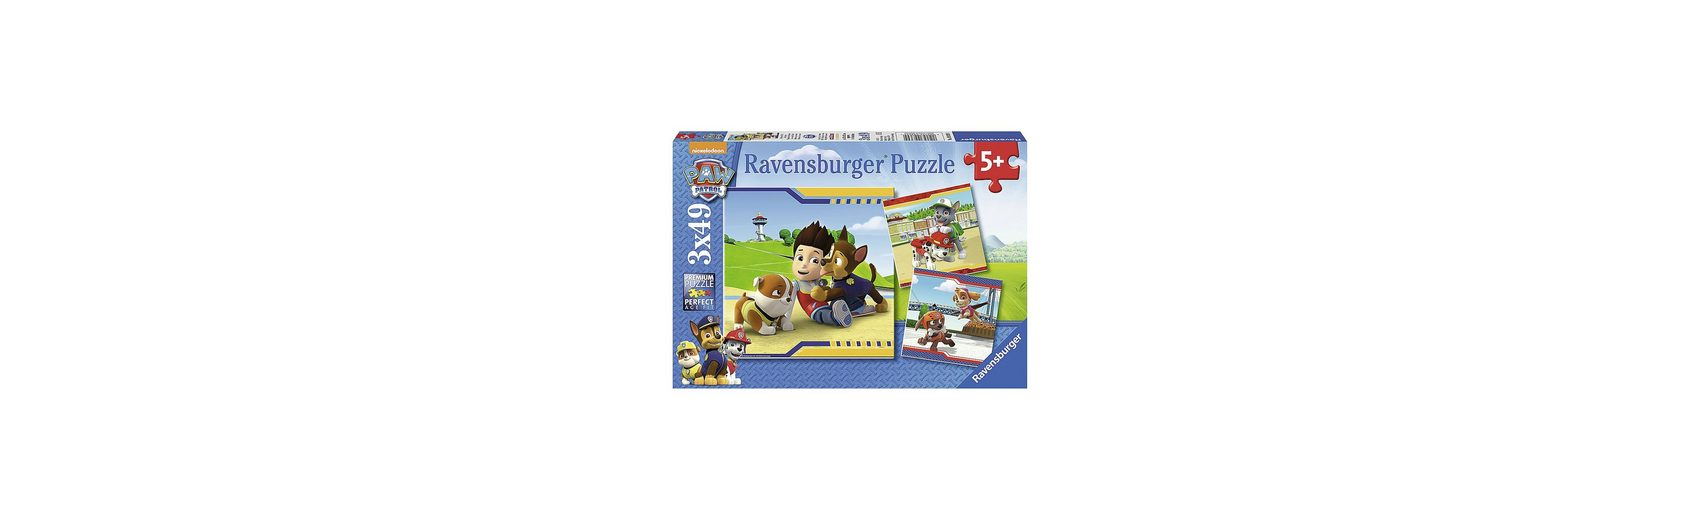 Ravensburger Puzzleset Paw Petrol: Helden mit Fell 3 x 49 Teile